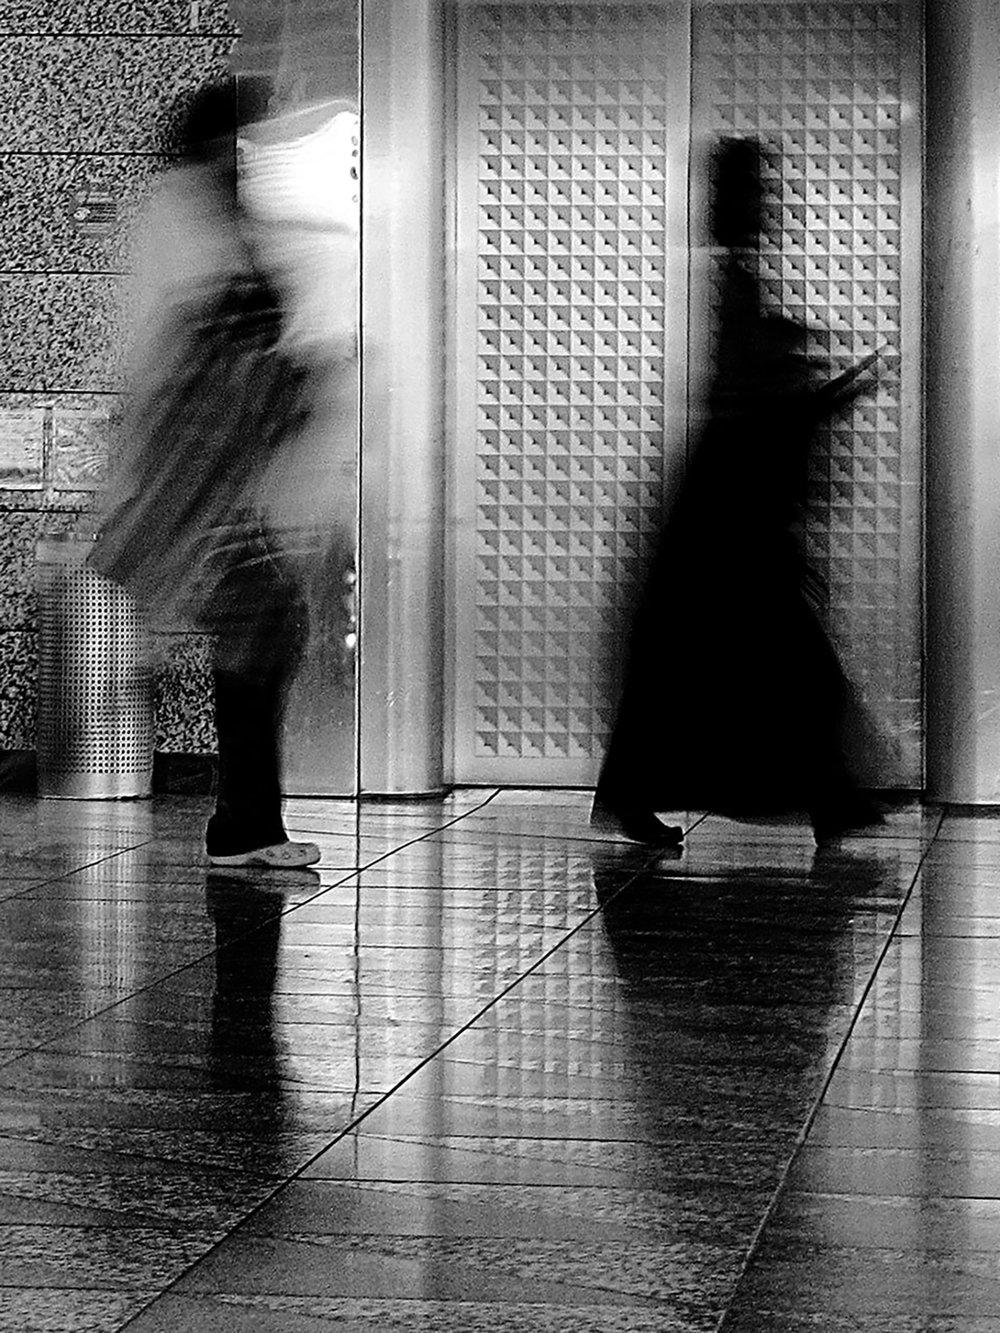 Shifra_Levyathan_In motion_04.jpg